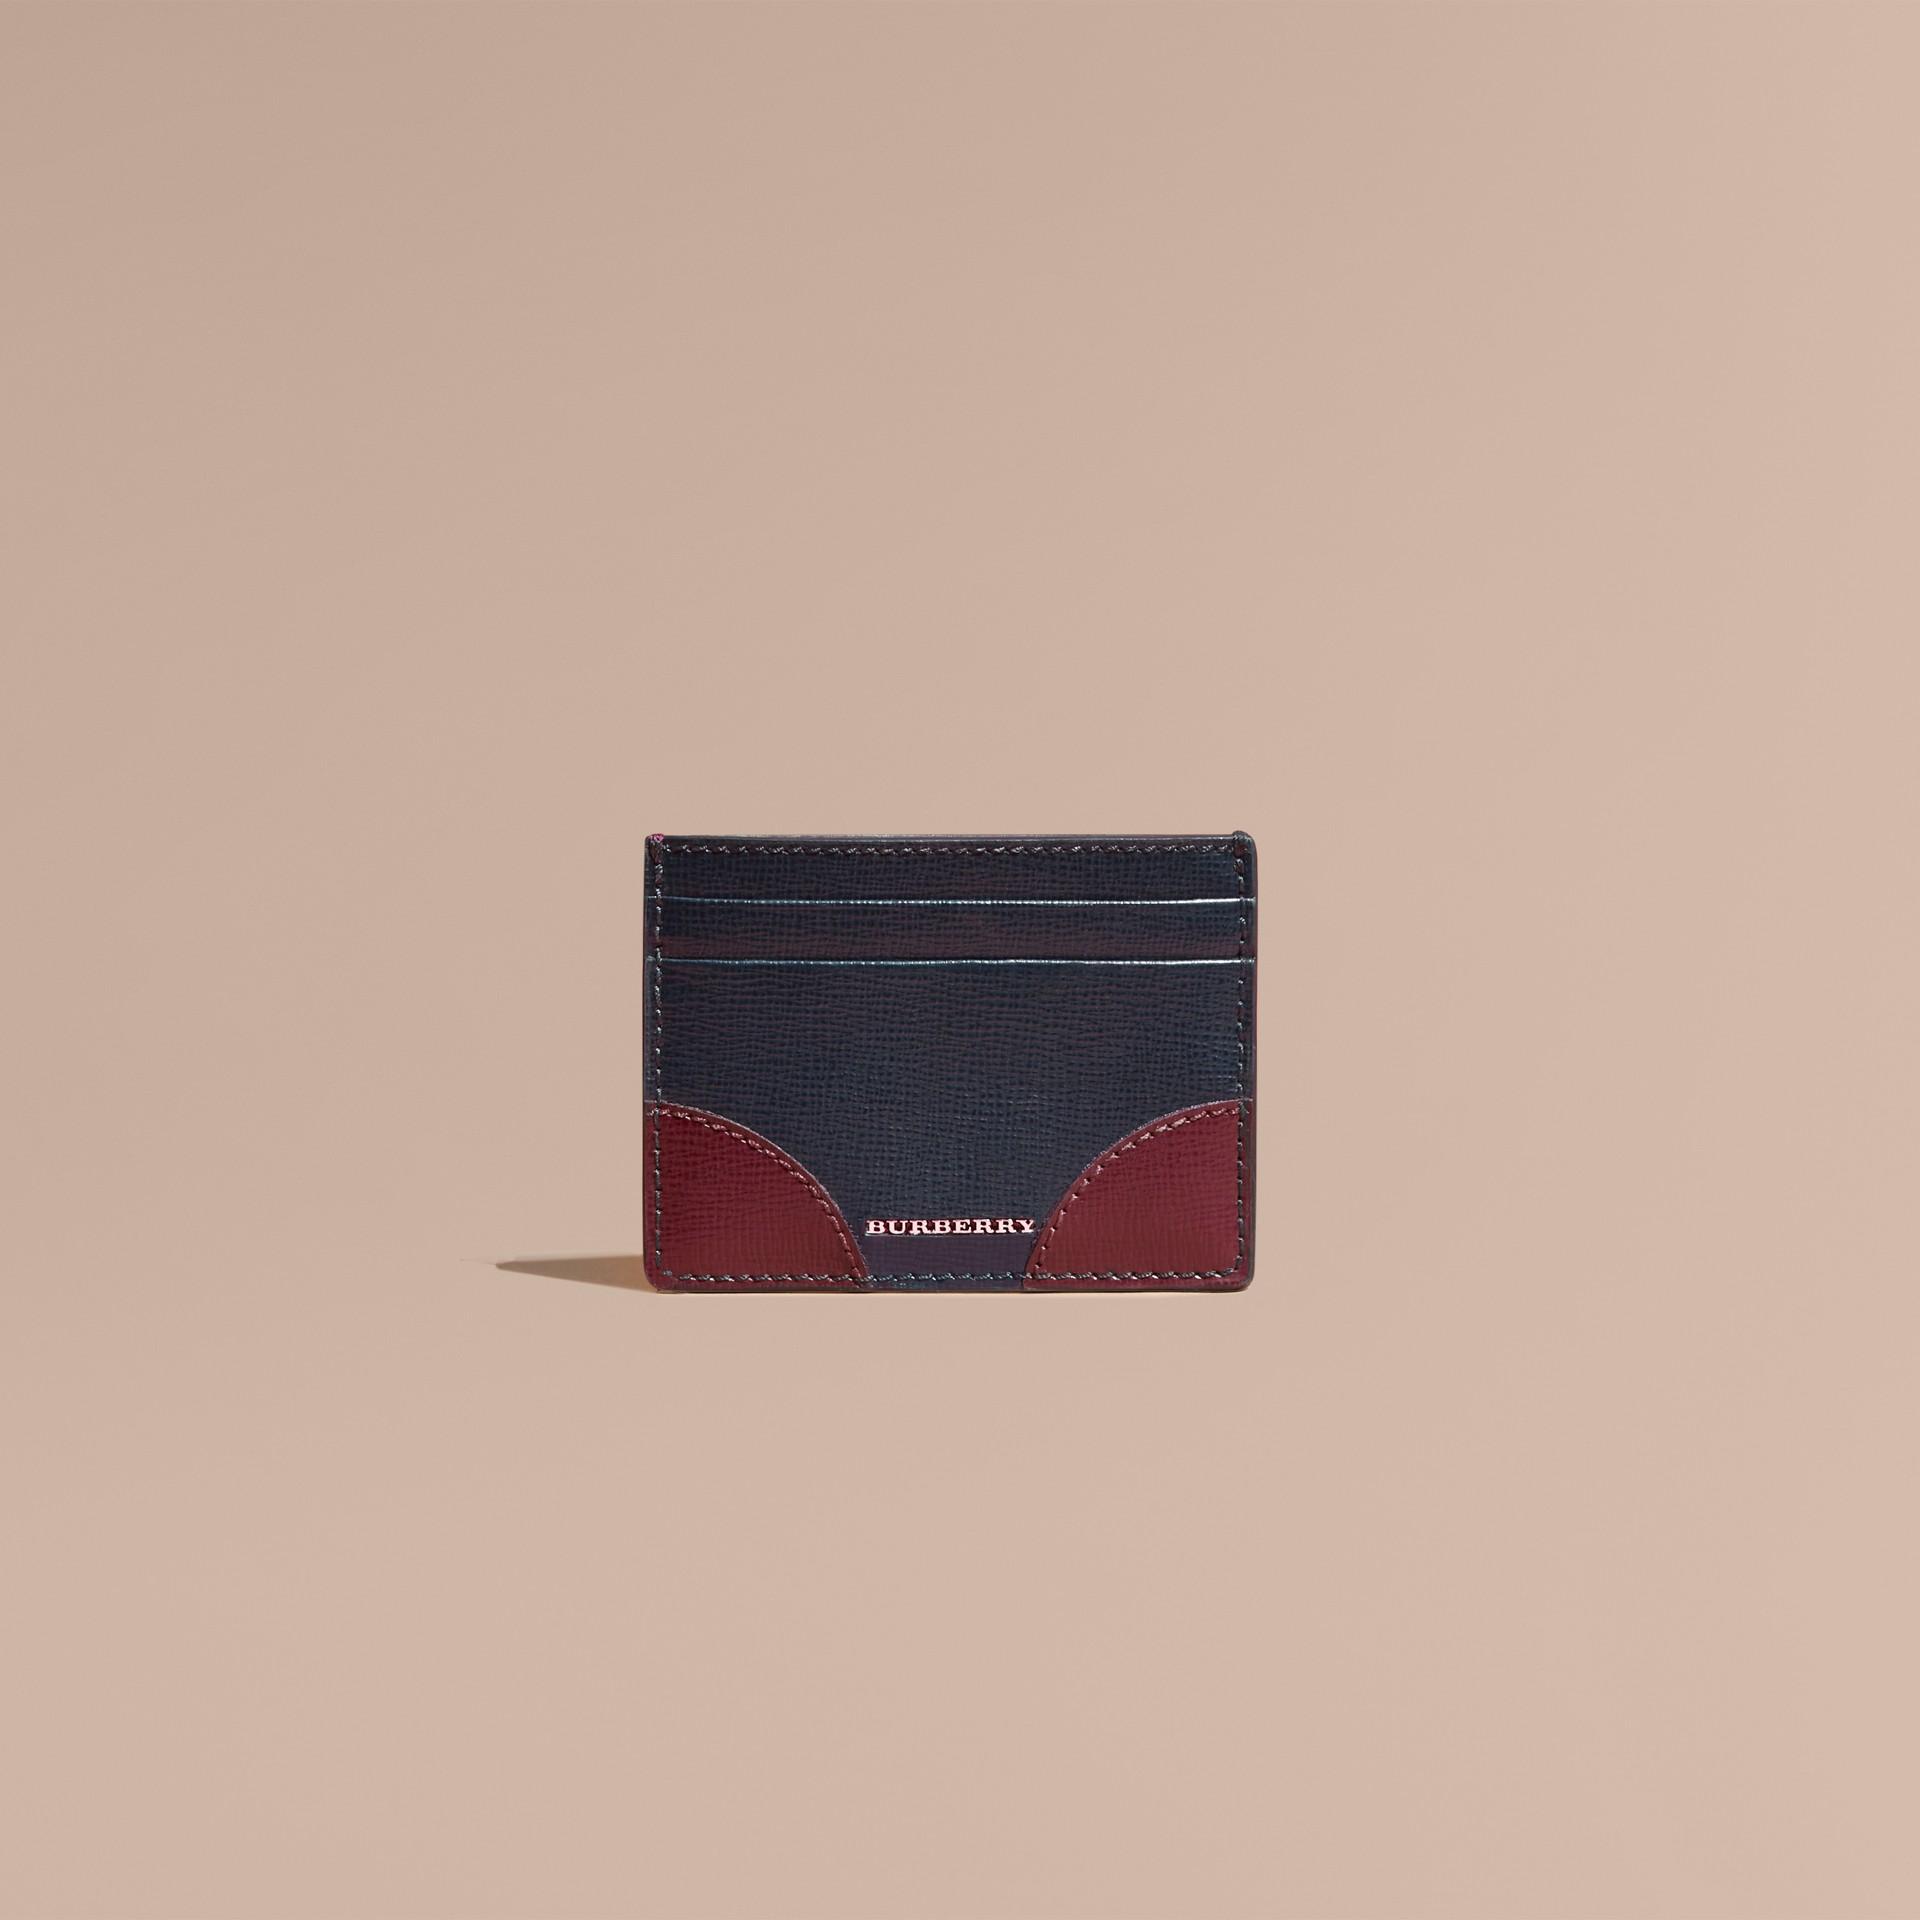 Contrast Corner London Leather Card Case in Dark Navy - gallery image 2